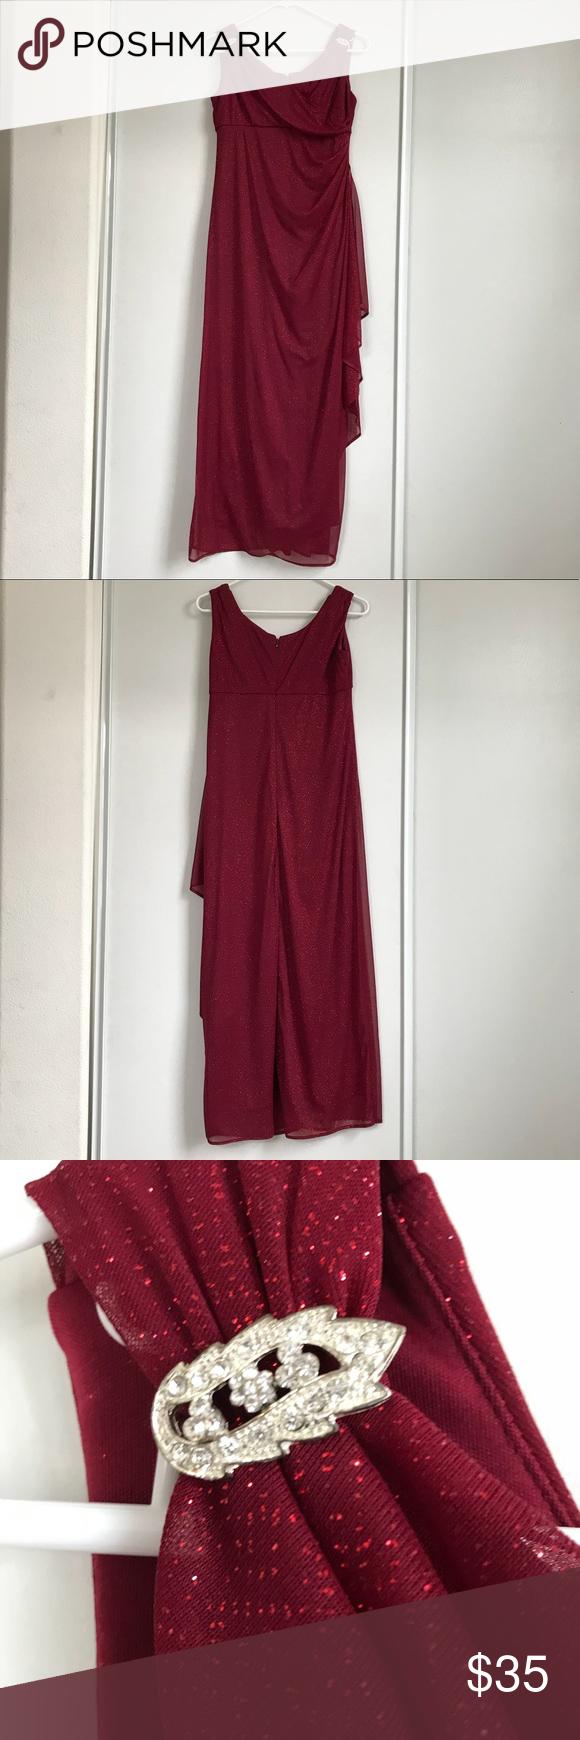 R u m richards gorgeous red glitter dress red elegant glitter dress